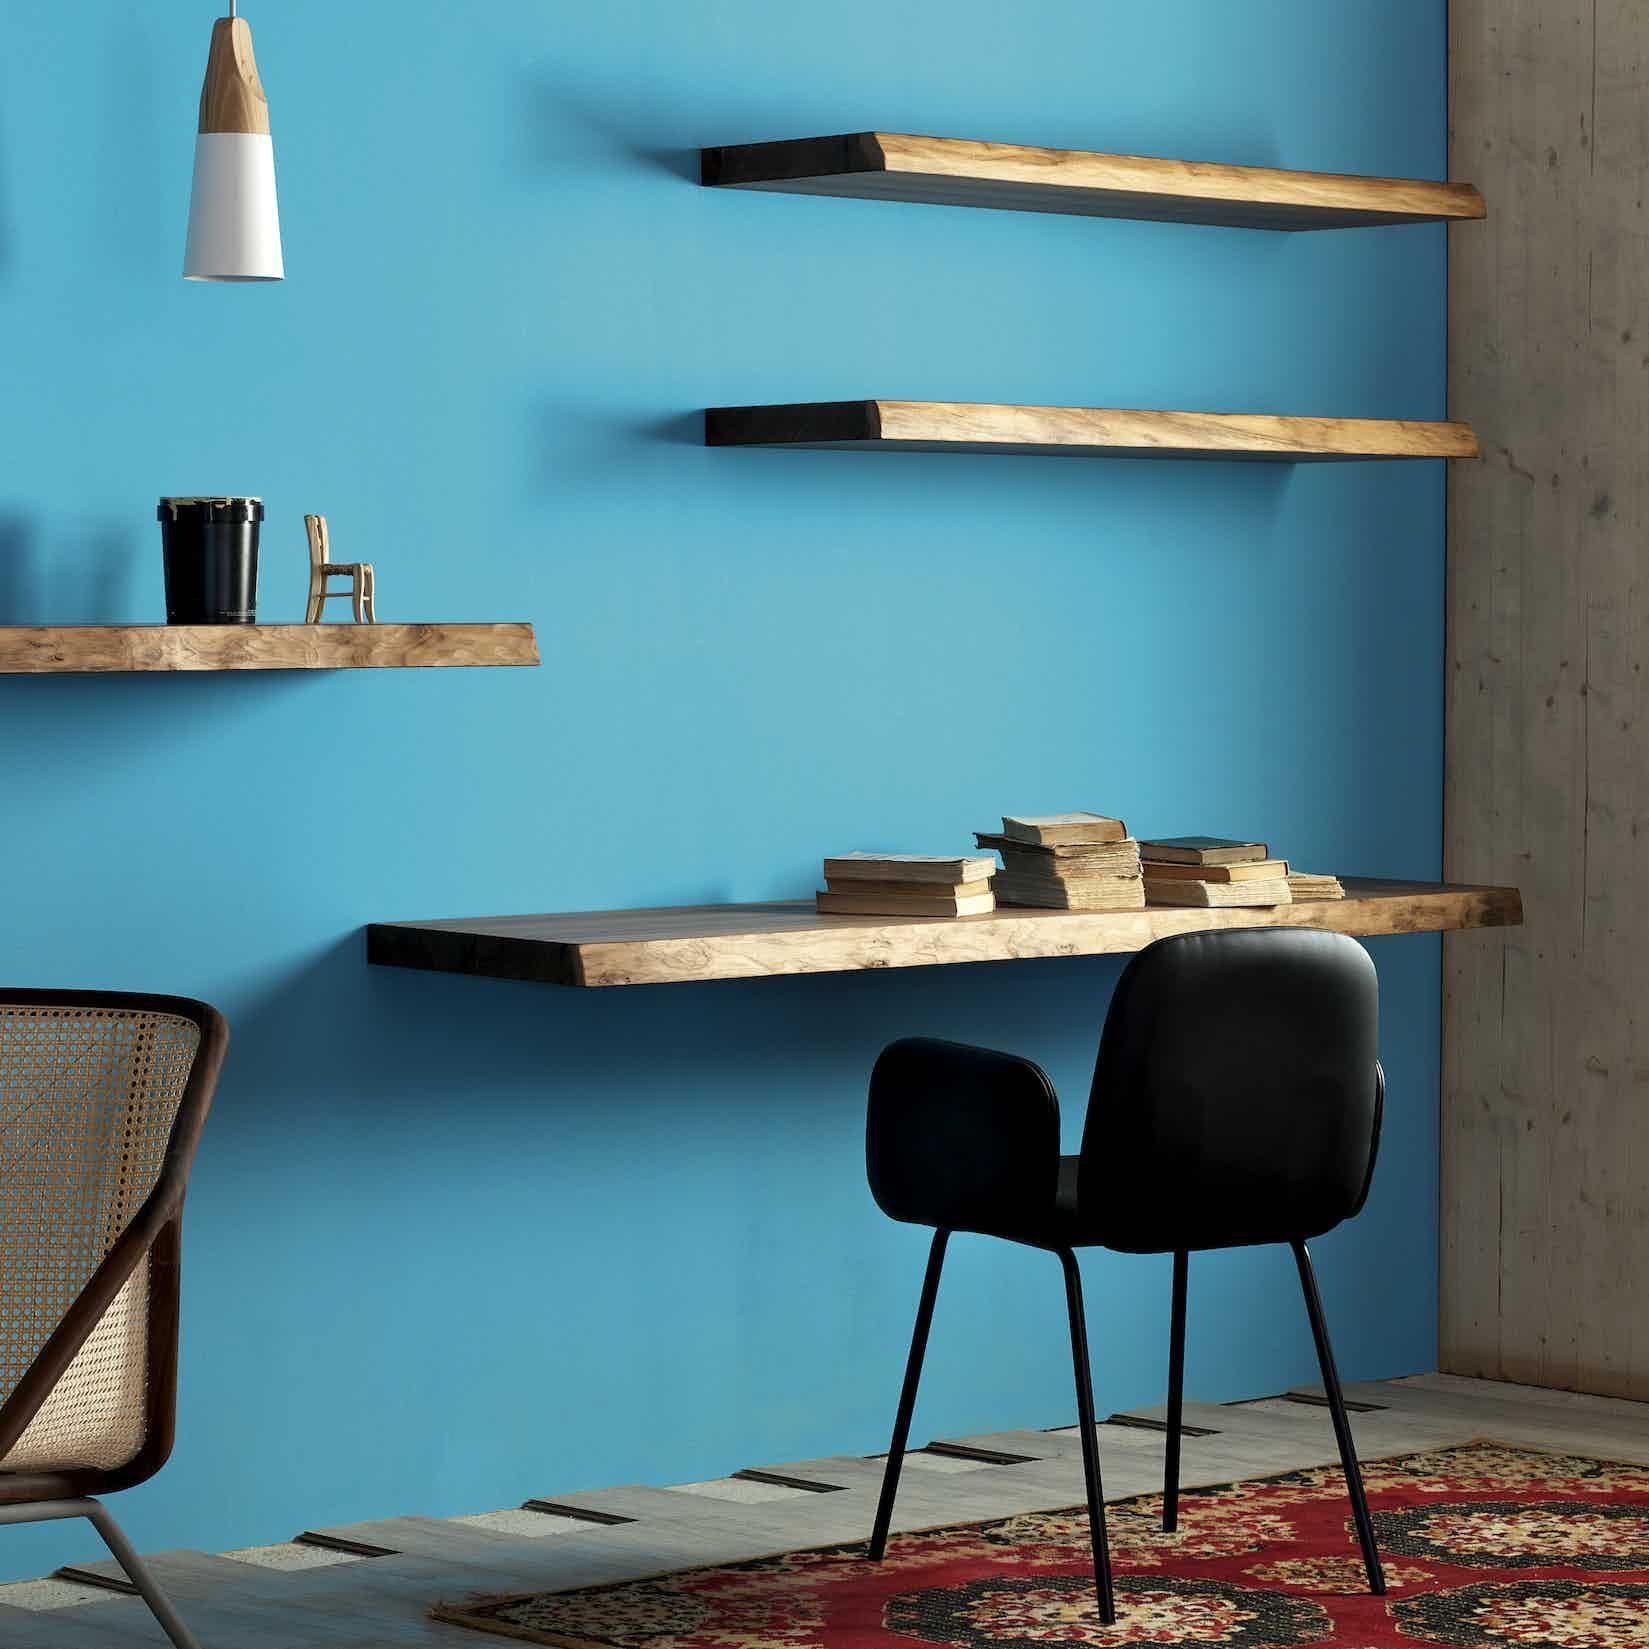 Miniforms Marangon Shelf Angle Haute Living